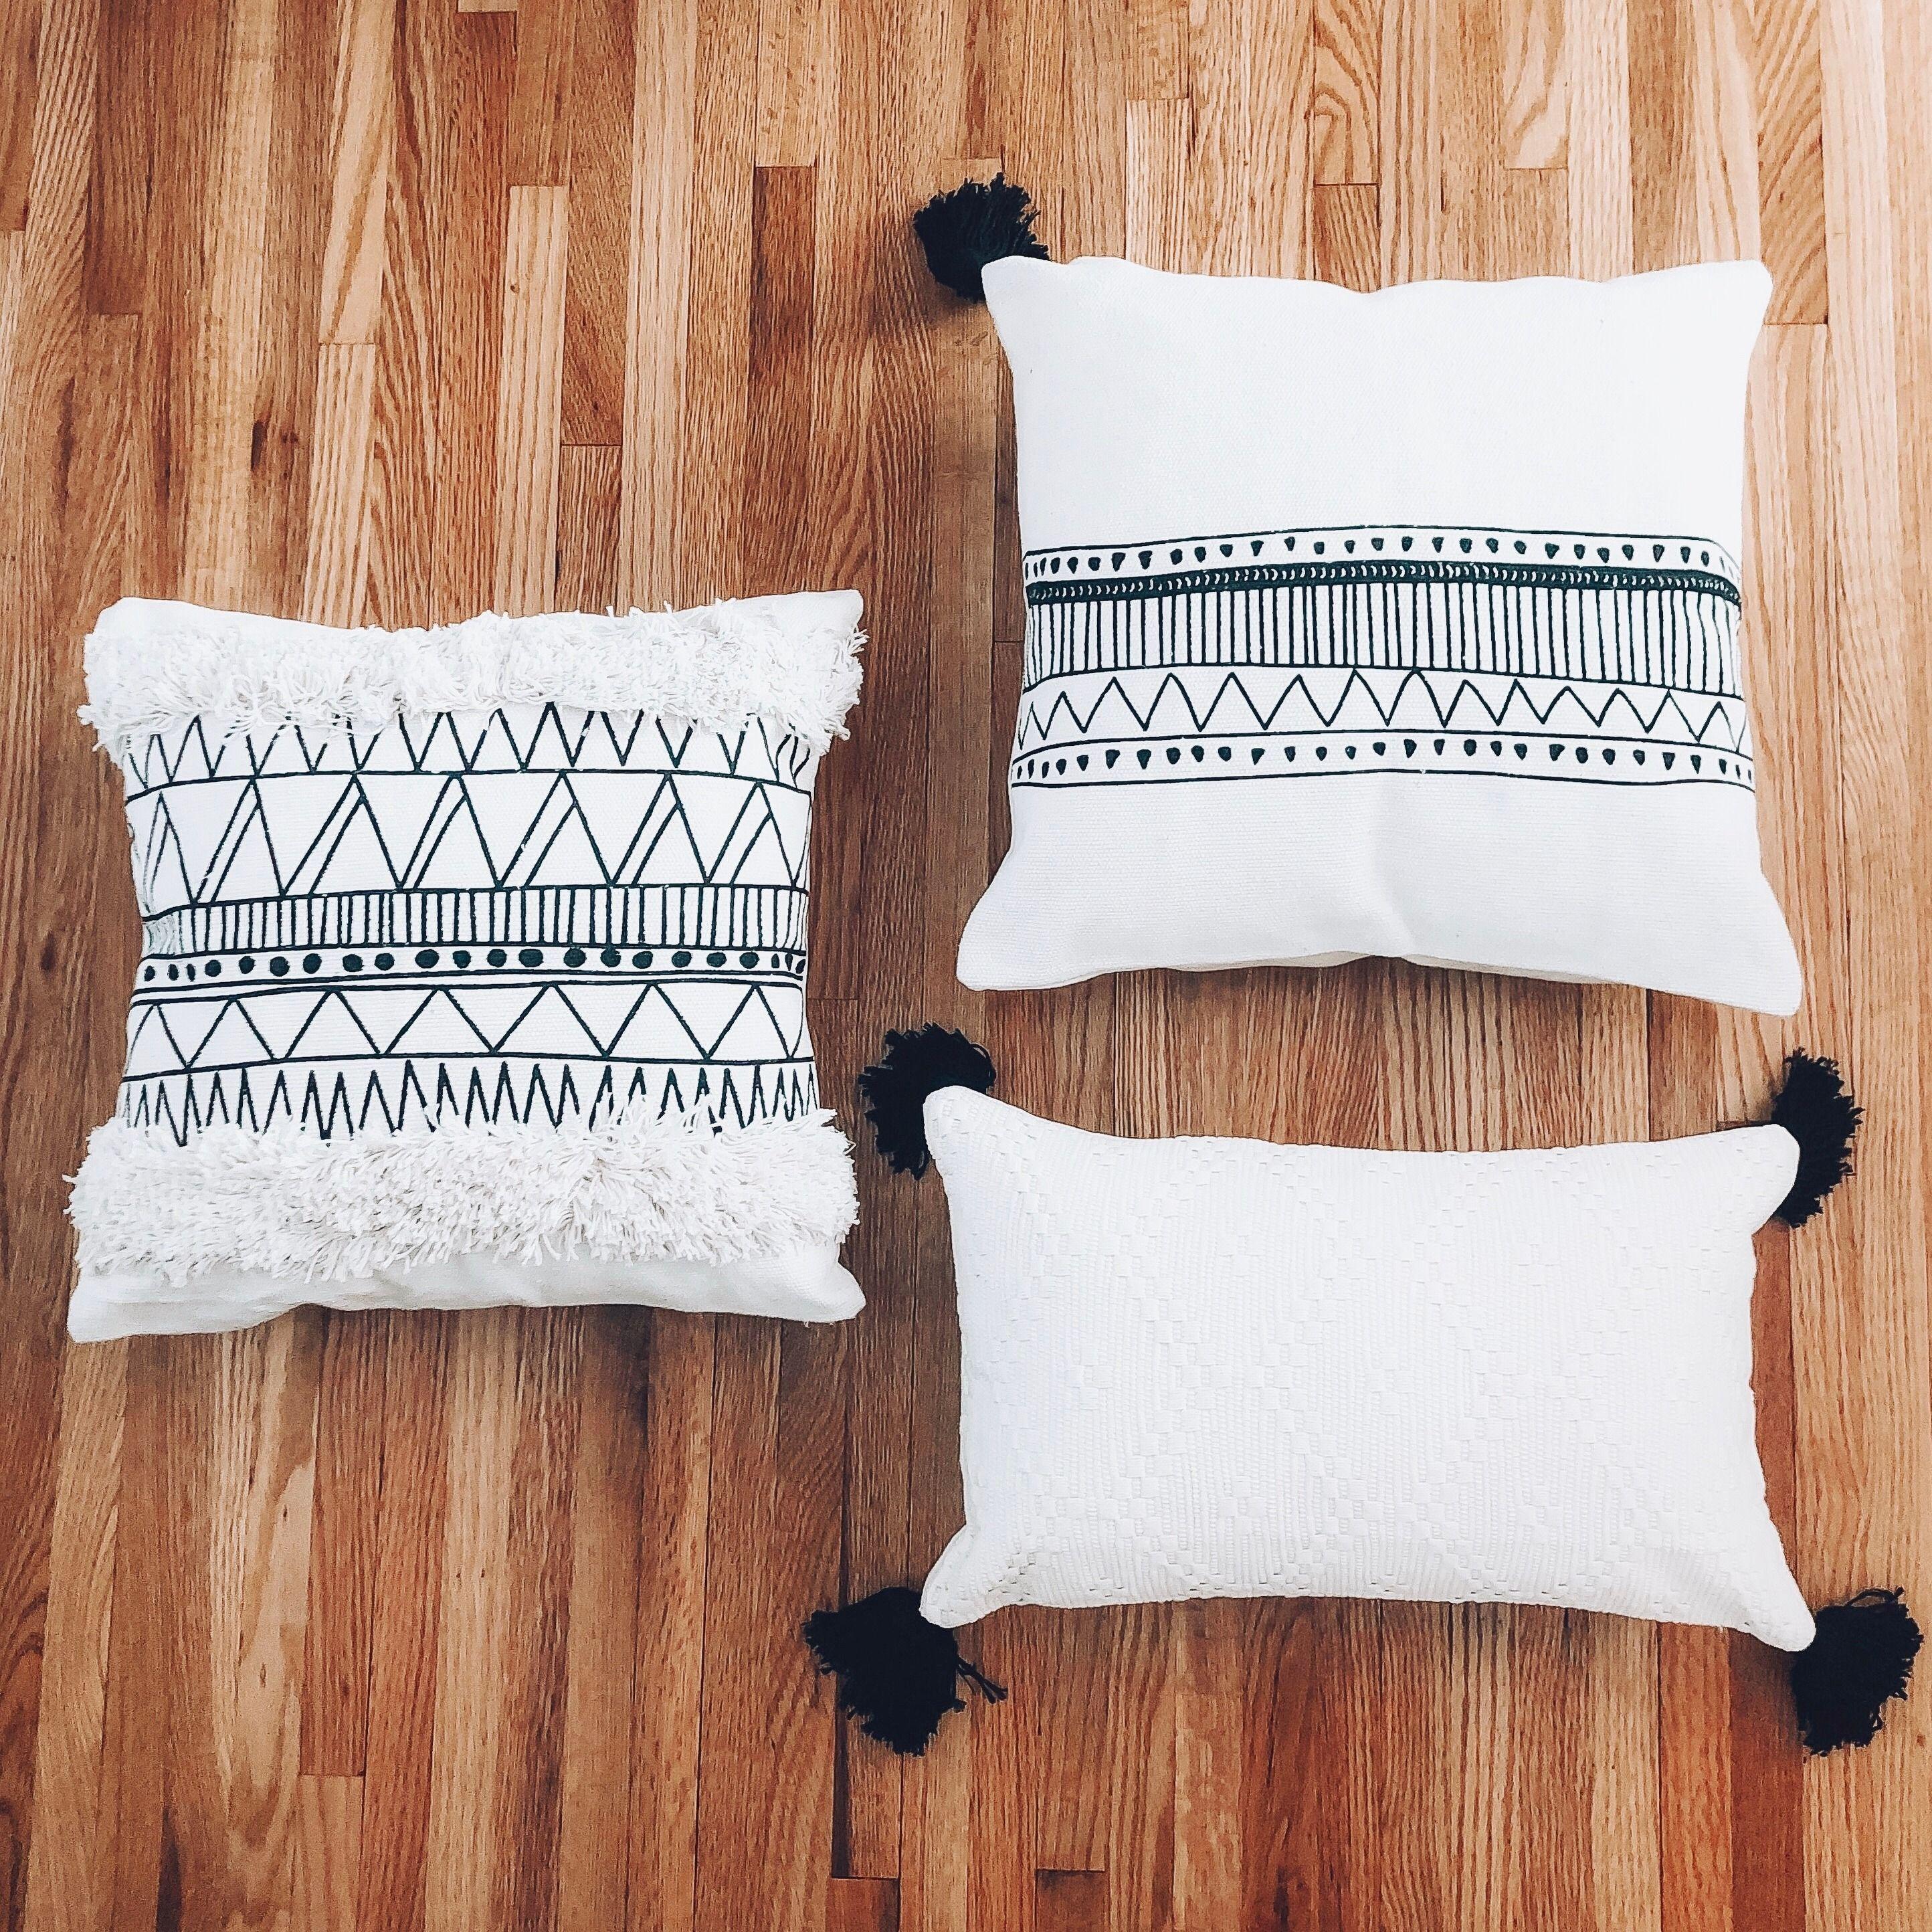 The Best Boho Design Pillows Diy Pillow Covers Boho Throw Pillows Diy Boho Style Pillows